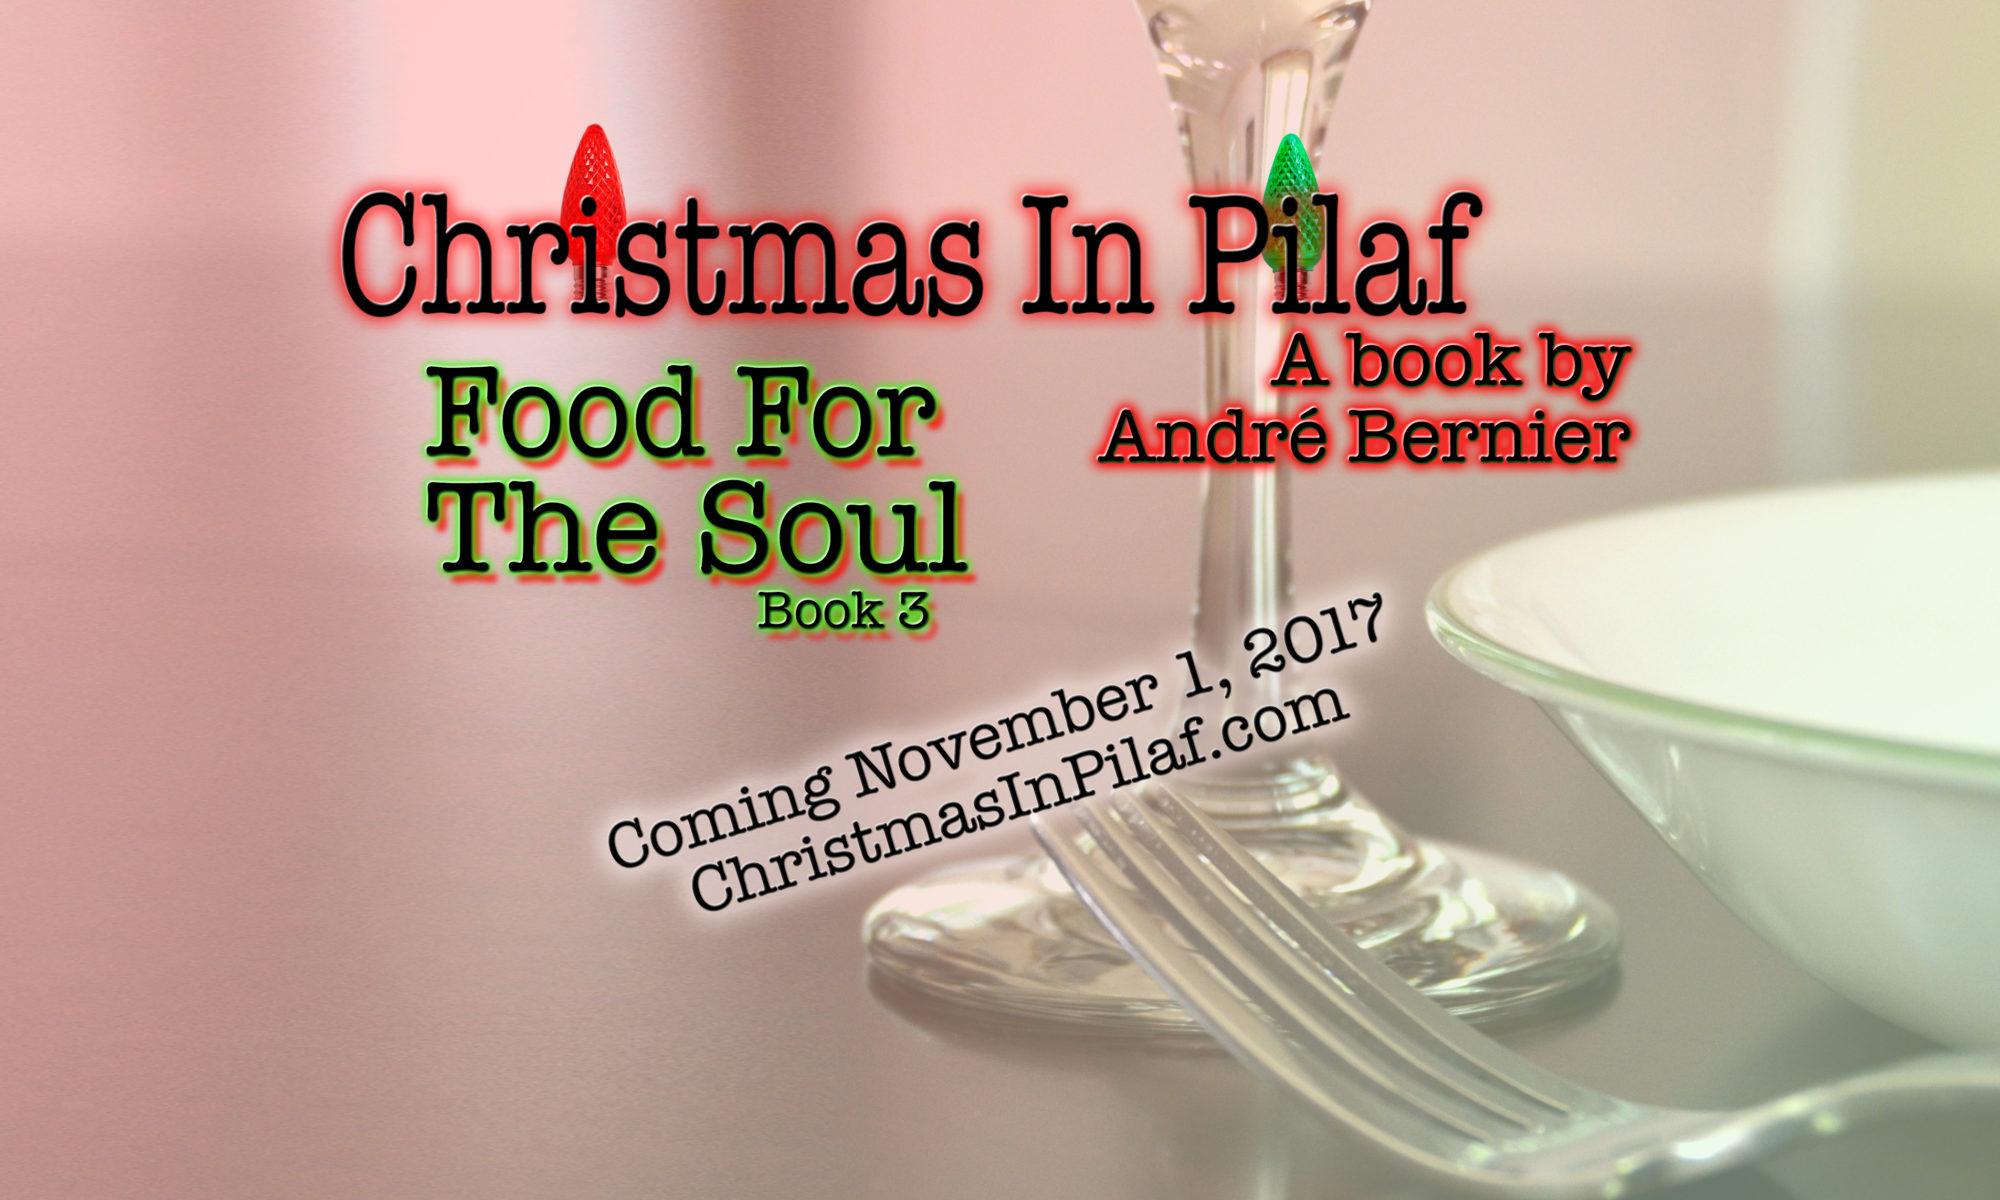 Christmas In Pilaf